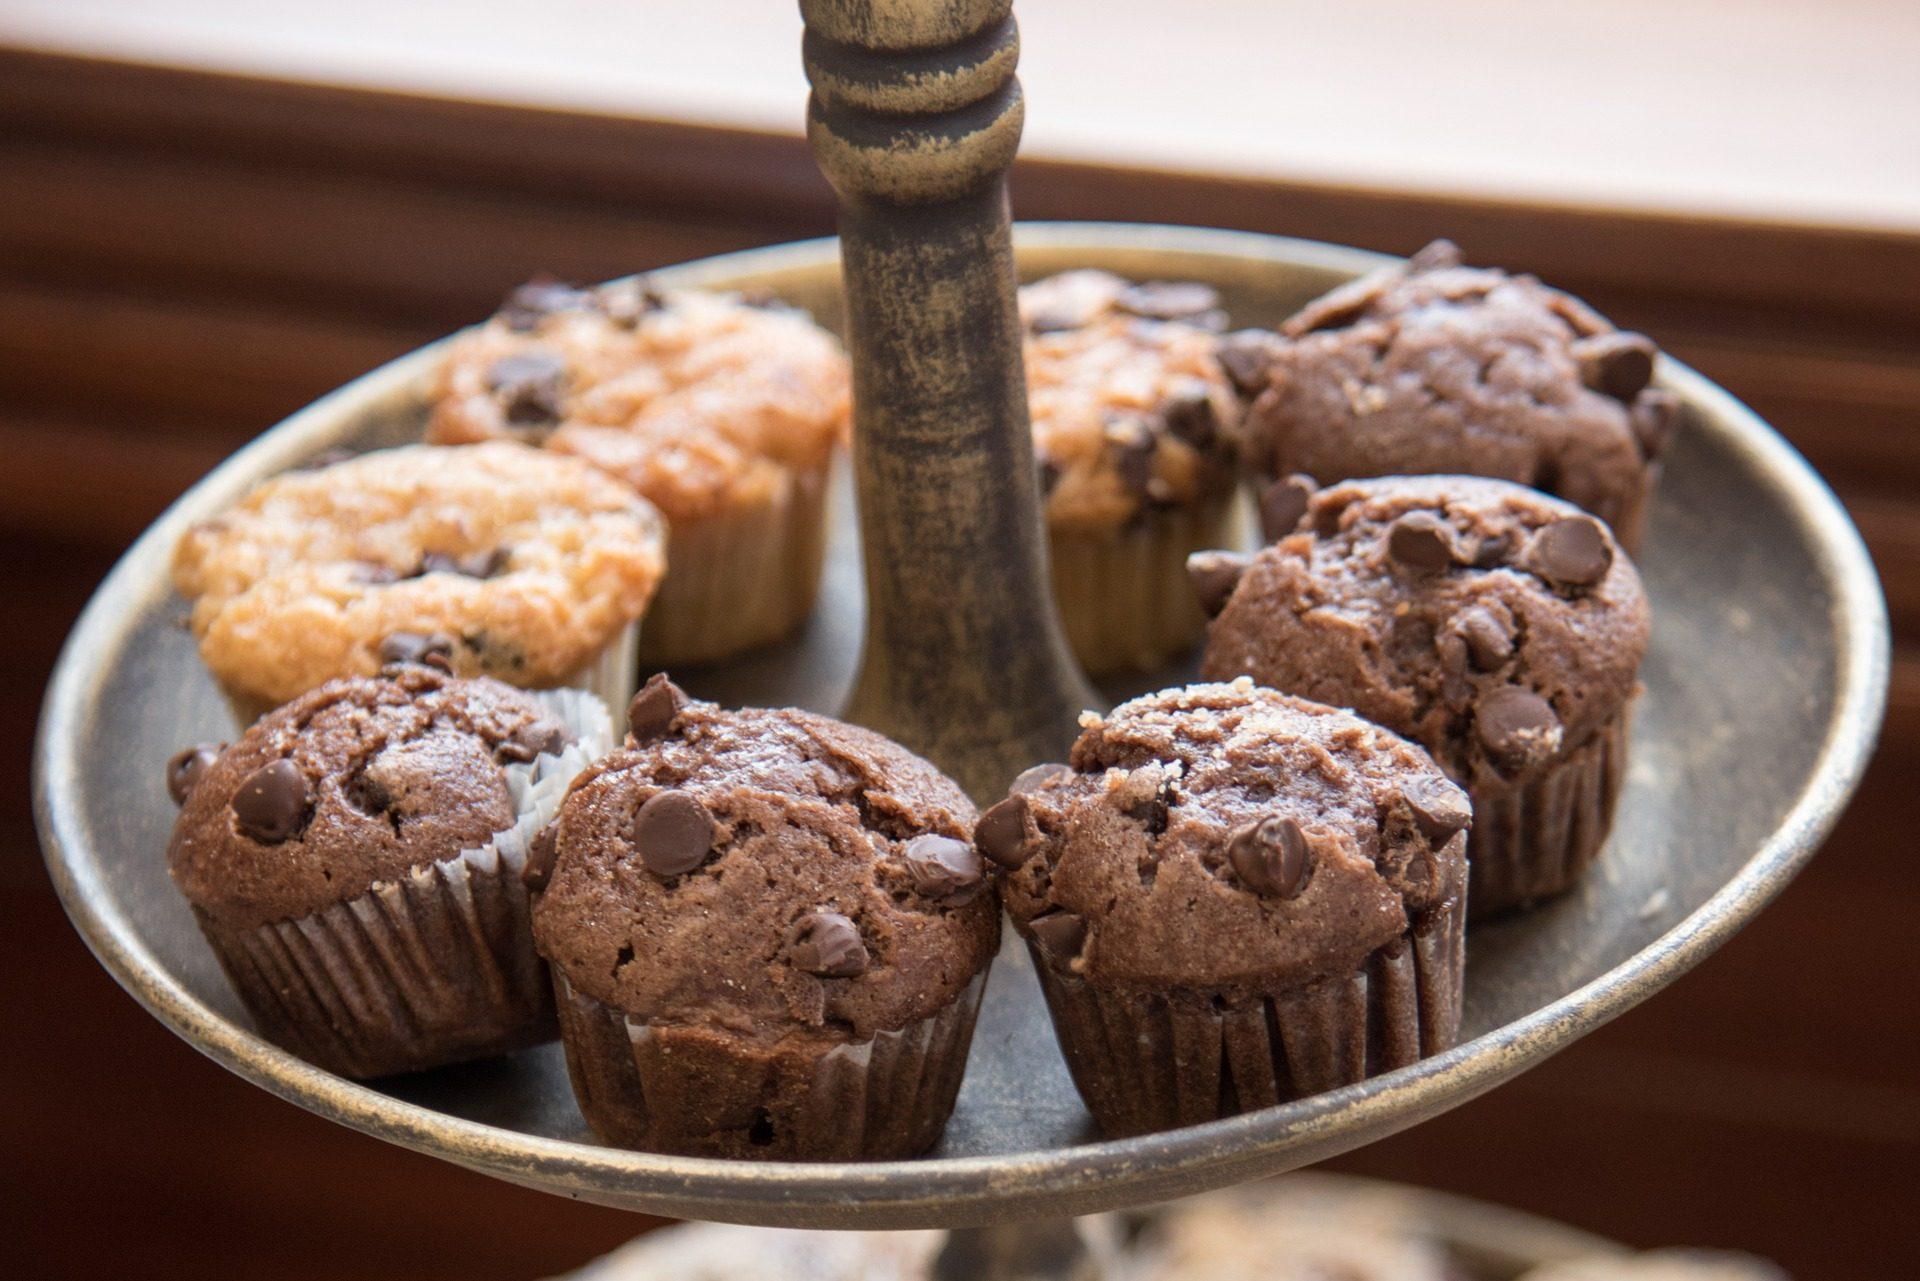 cupcakes, muffins, Γλυκό, επιδόρπια, ζαχαροπλαστικής, σοκολάτα - Wallpapers HD - Professor-falken.com